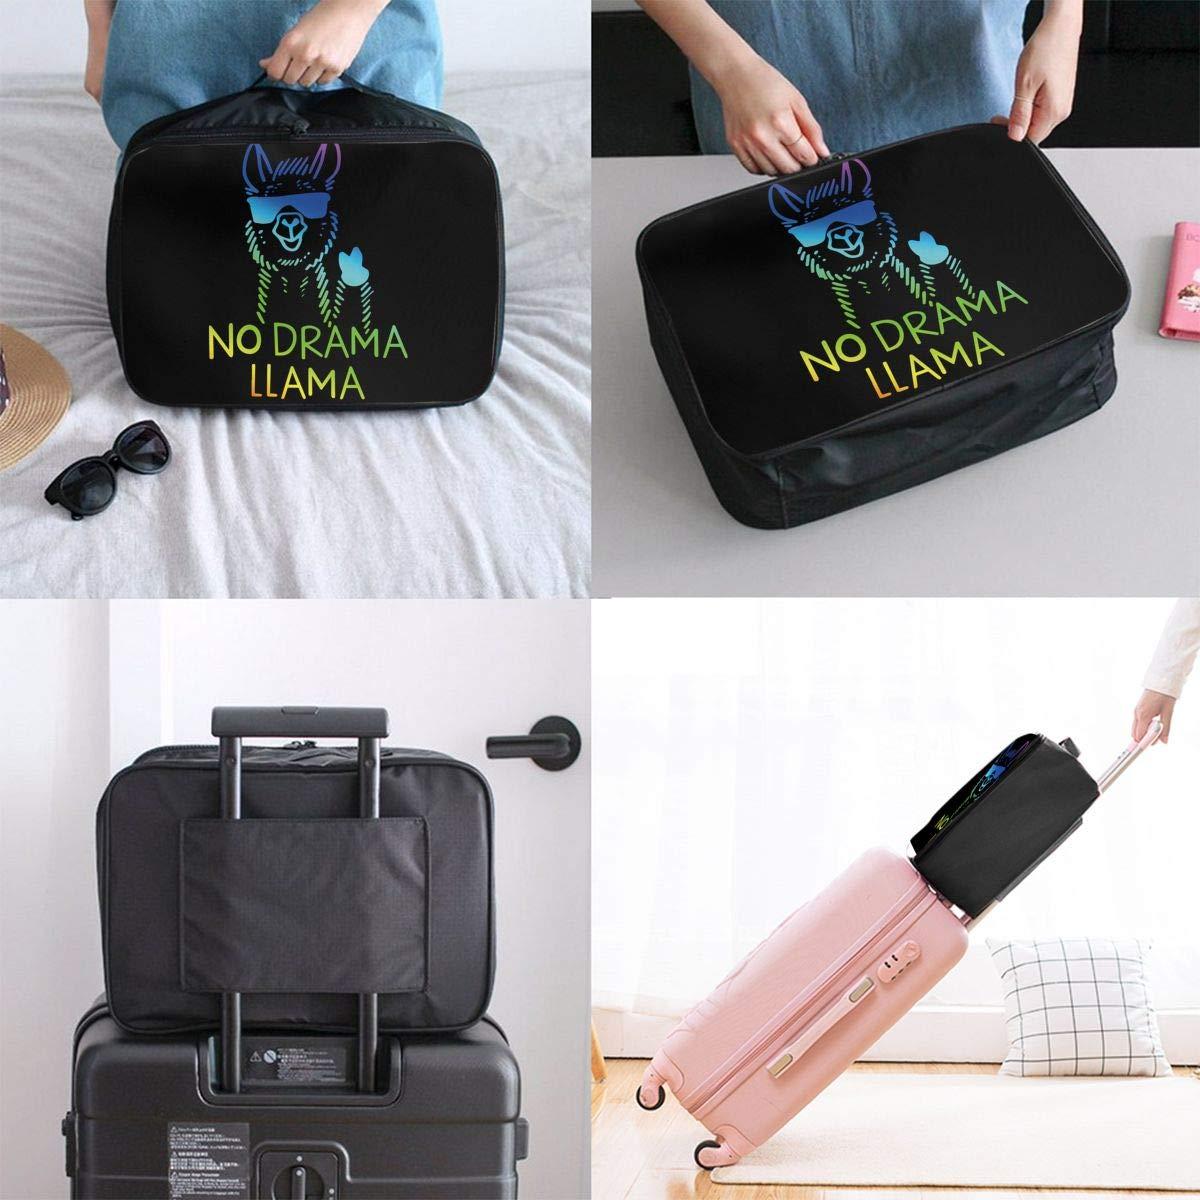 YueLJB No Drama Llama Lightweight Large Capacity Portable Luggage Bag Travel Duffel Bag Storage Carry Luggage Duffle Tote Bag